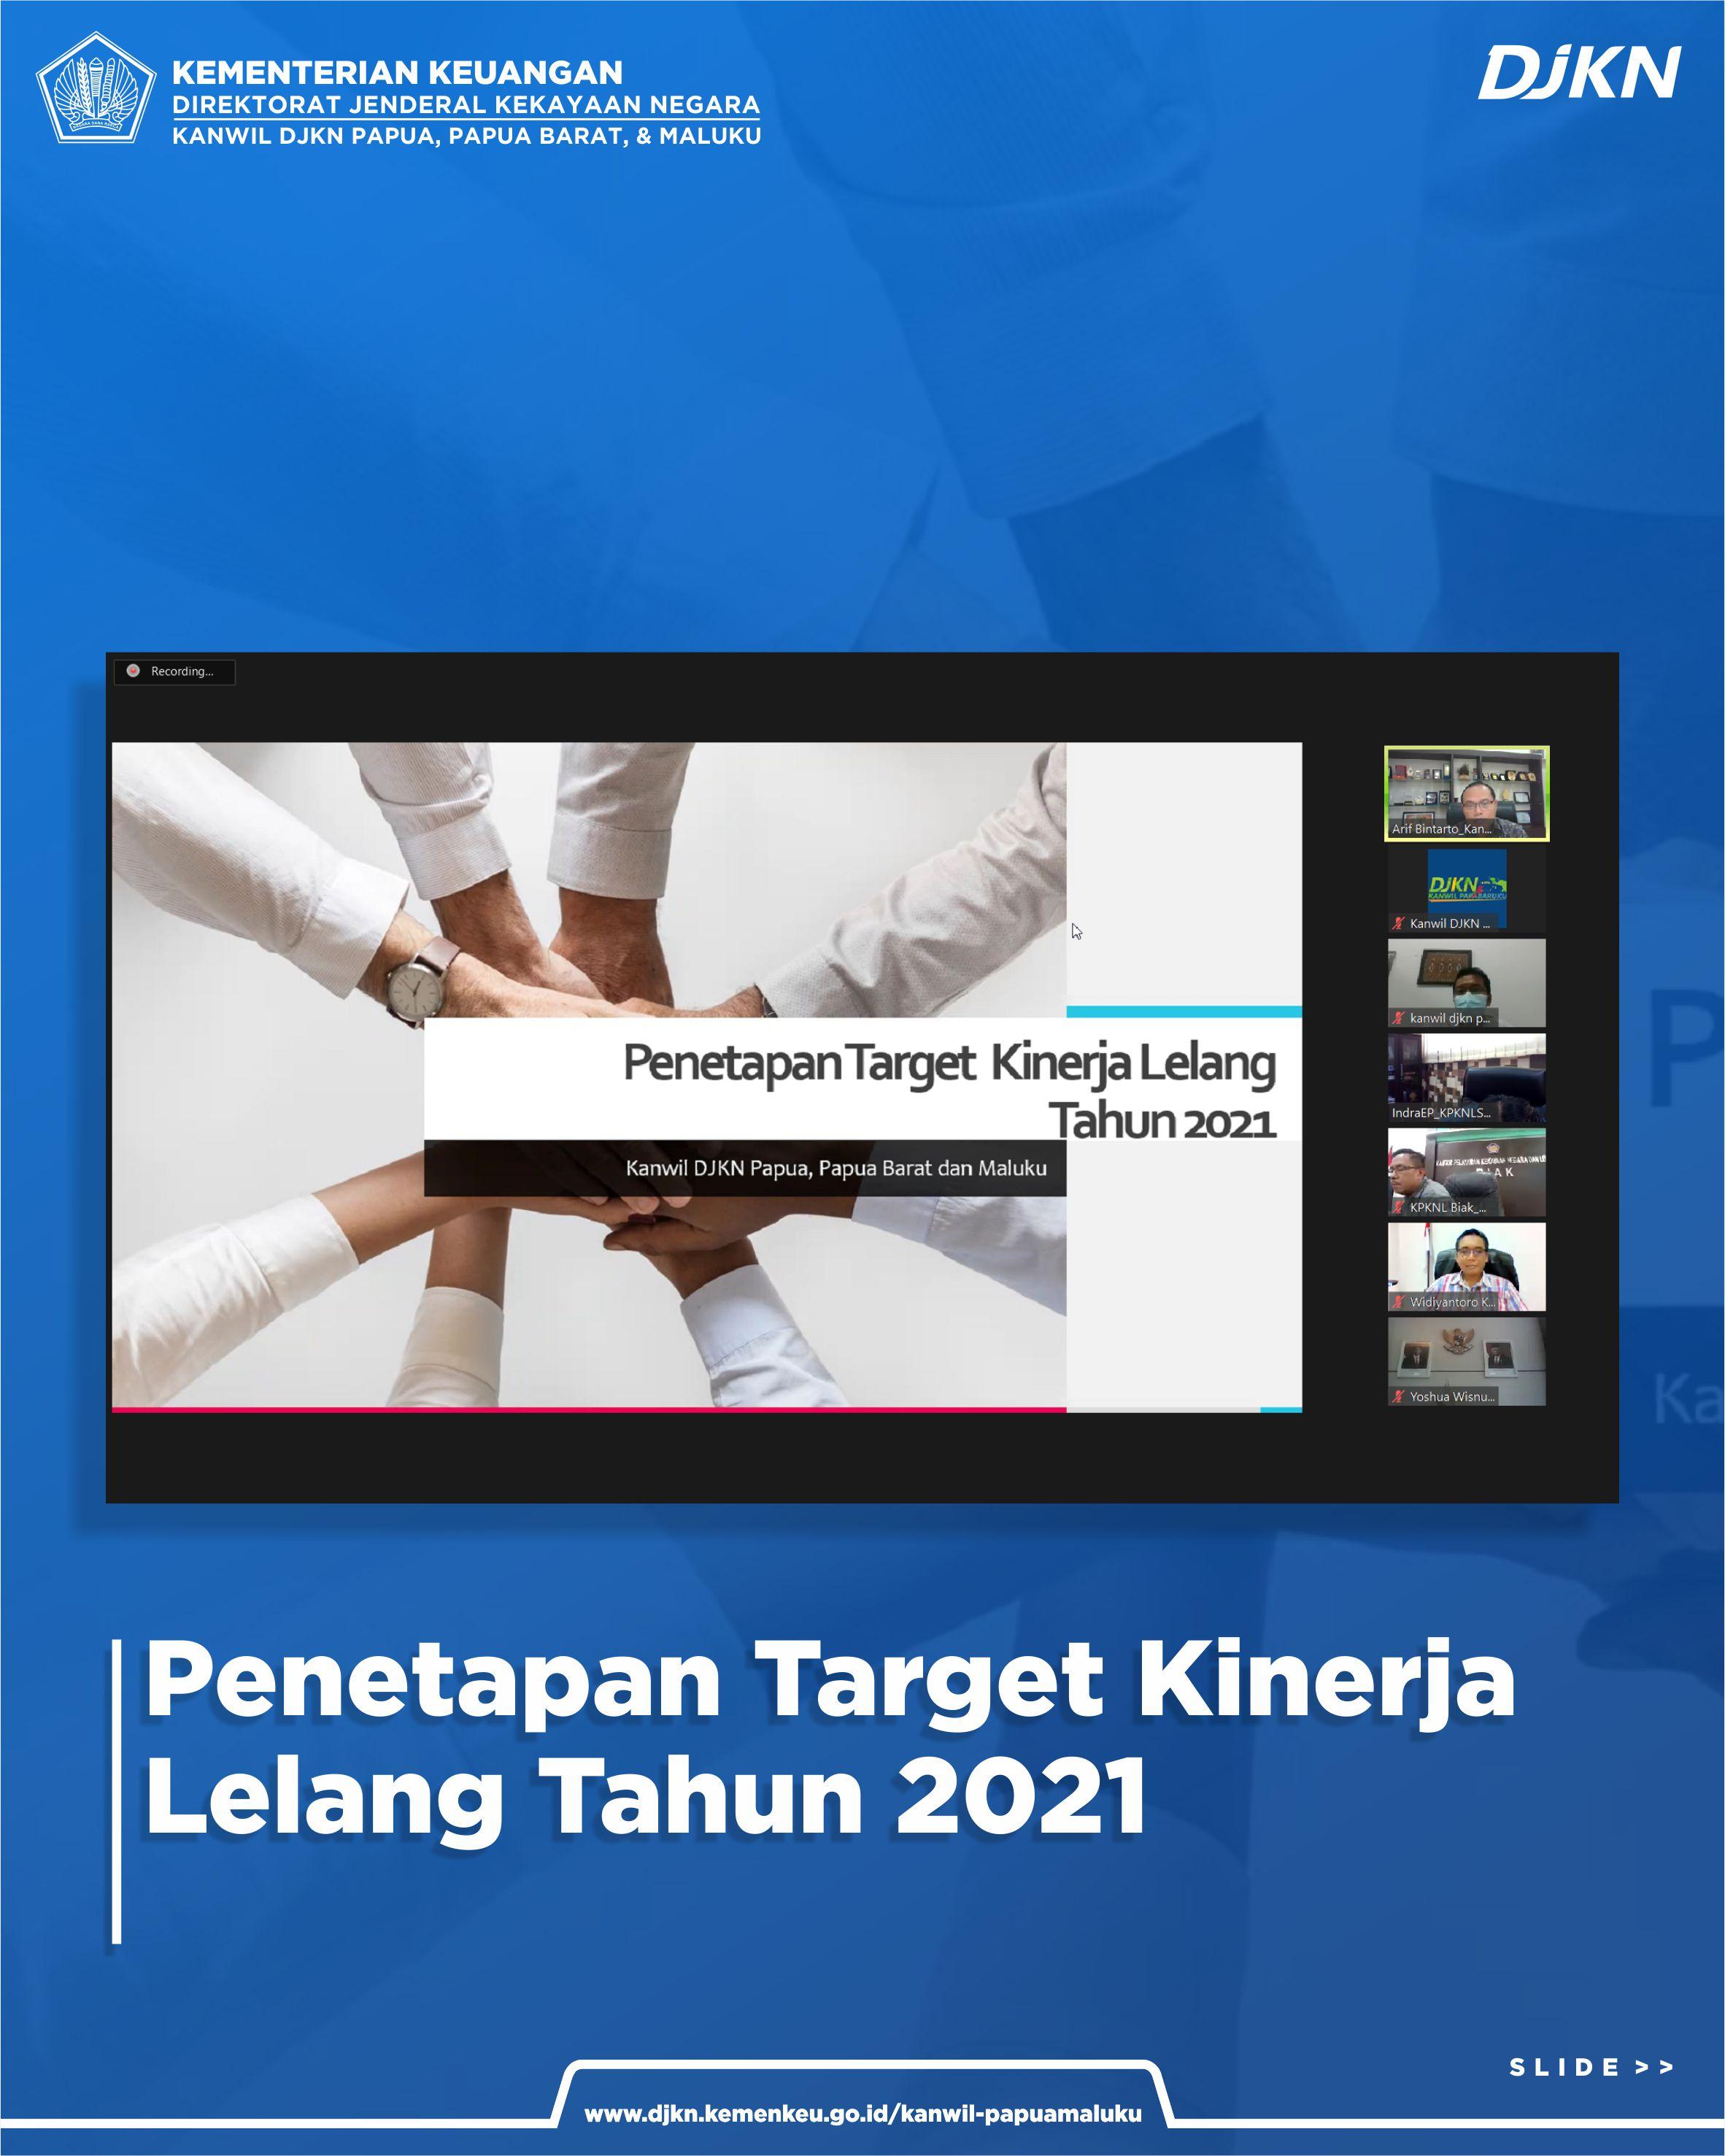 Rapat Penetapan Target Lelang Tahun 2021 Kanwil DJKN Papabaruku